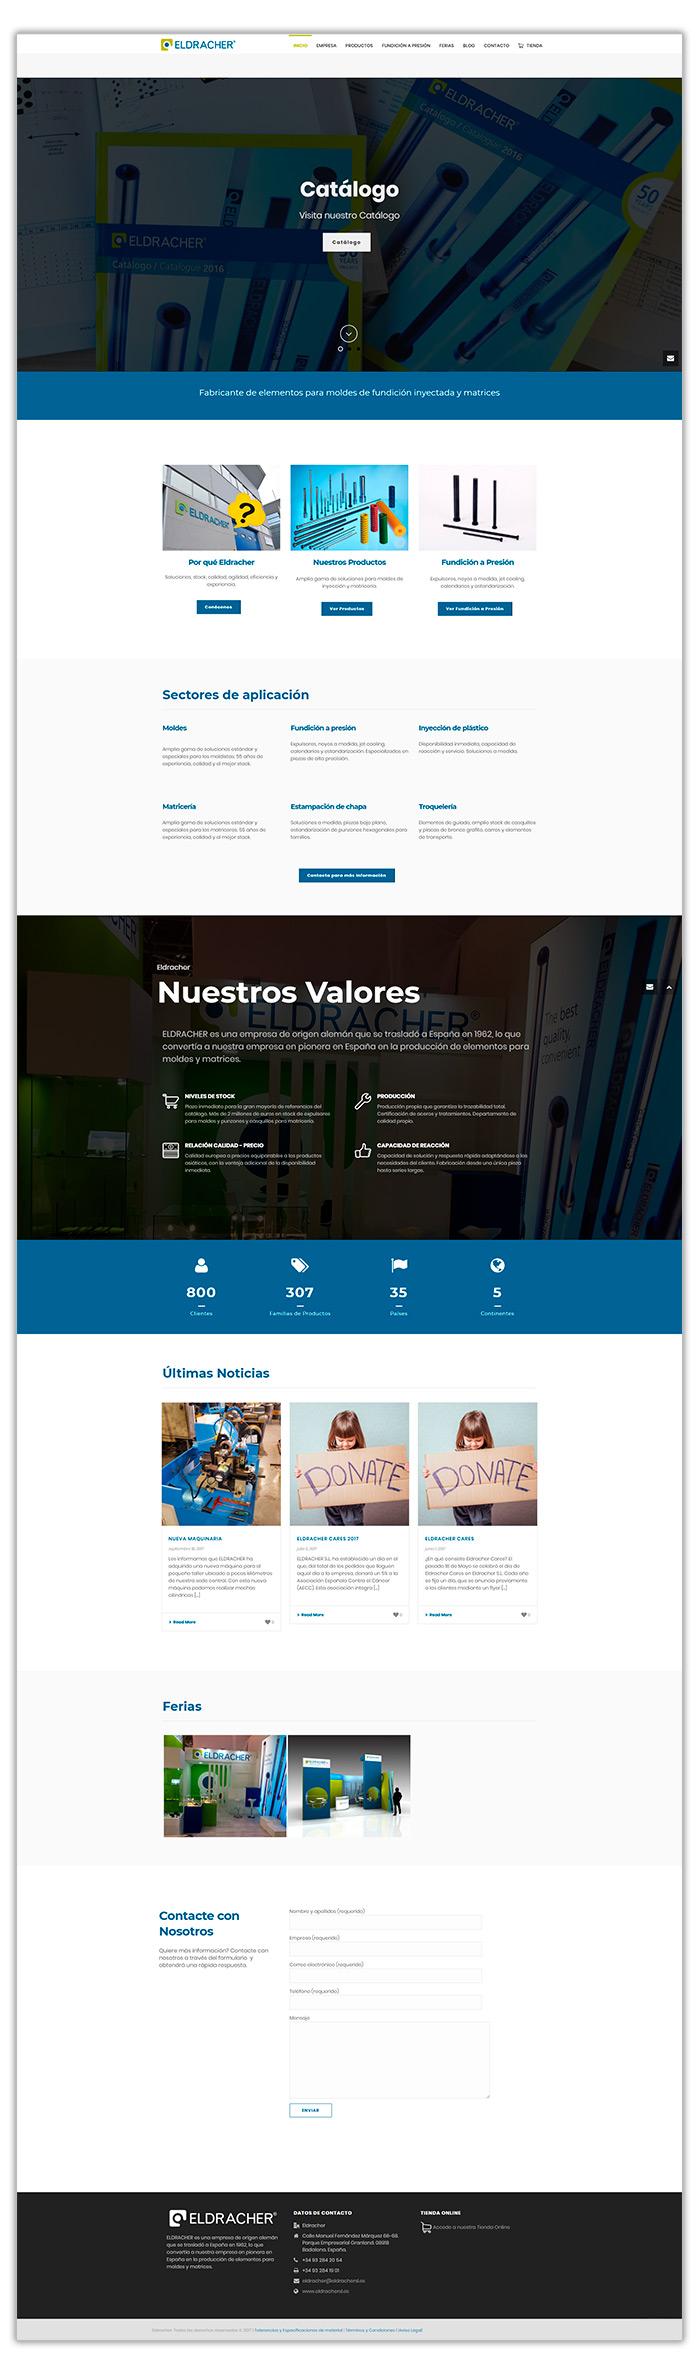 diseno-pagina-web-empresa-moldes-matrices